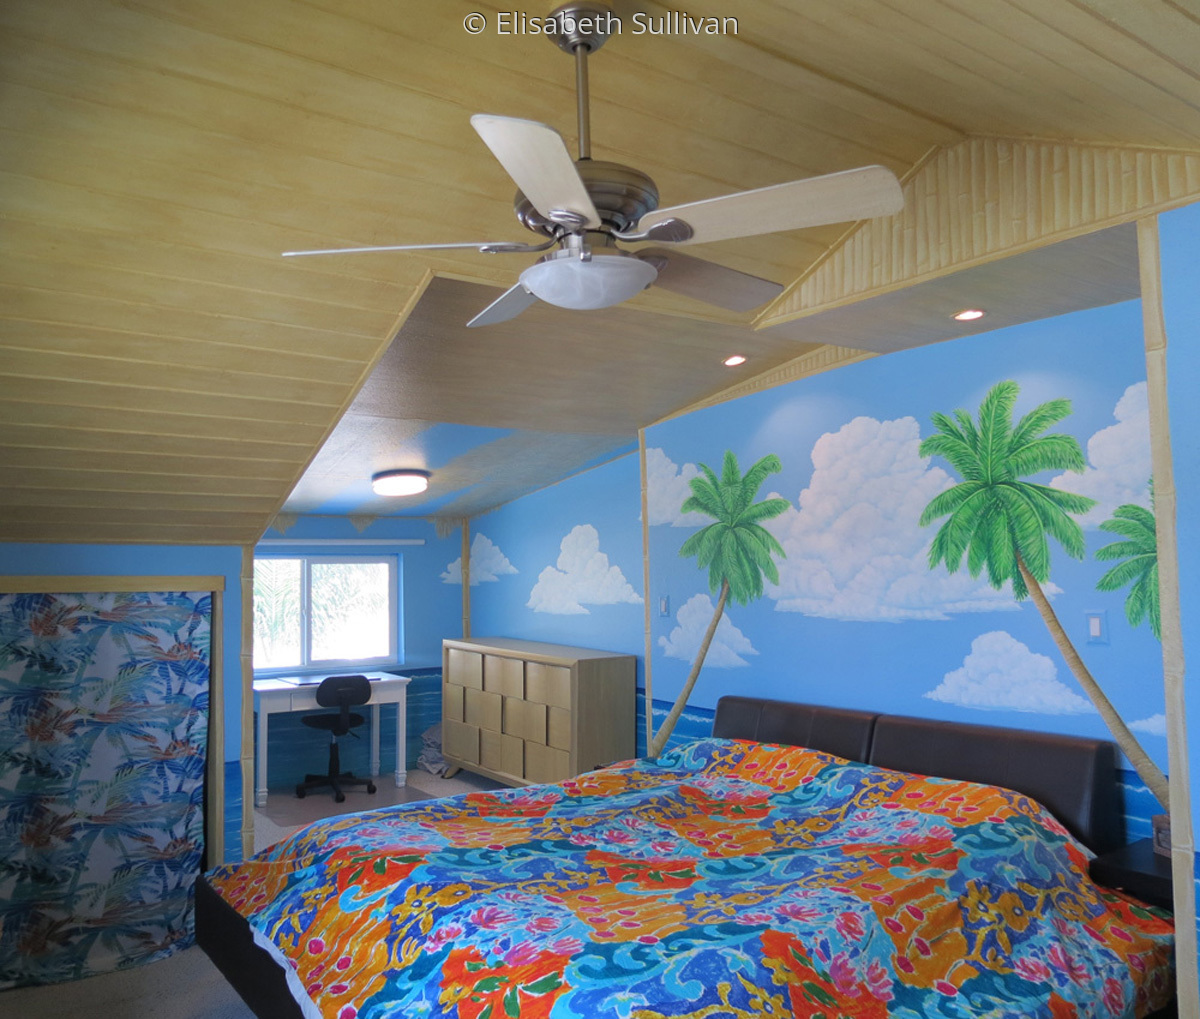 Bedroom Hut Mural (large view)